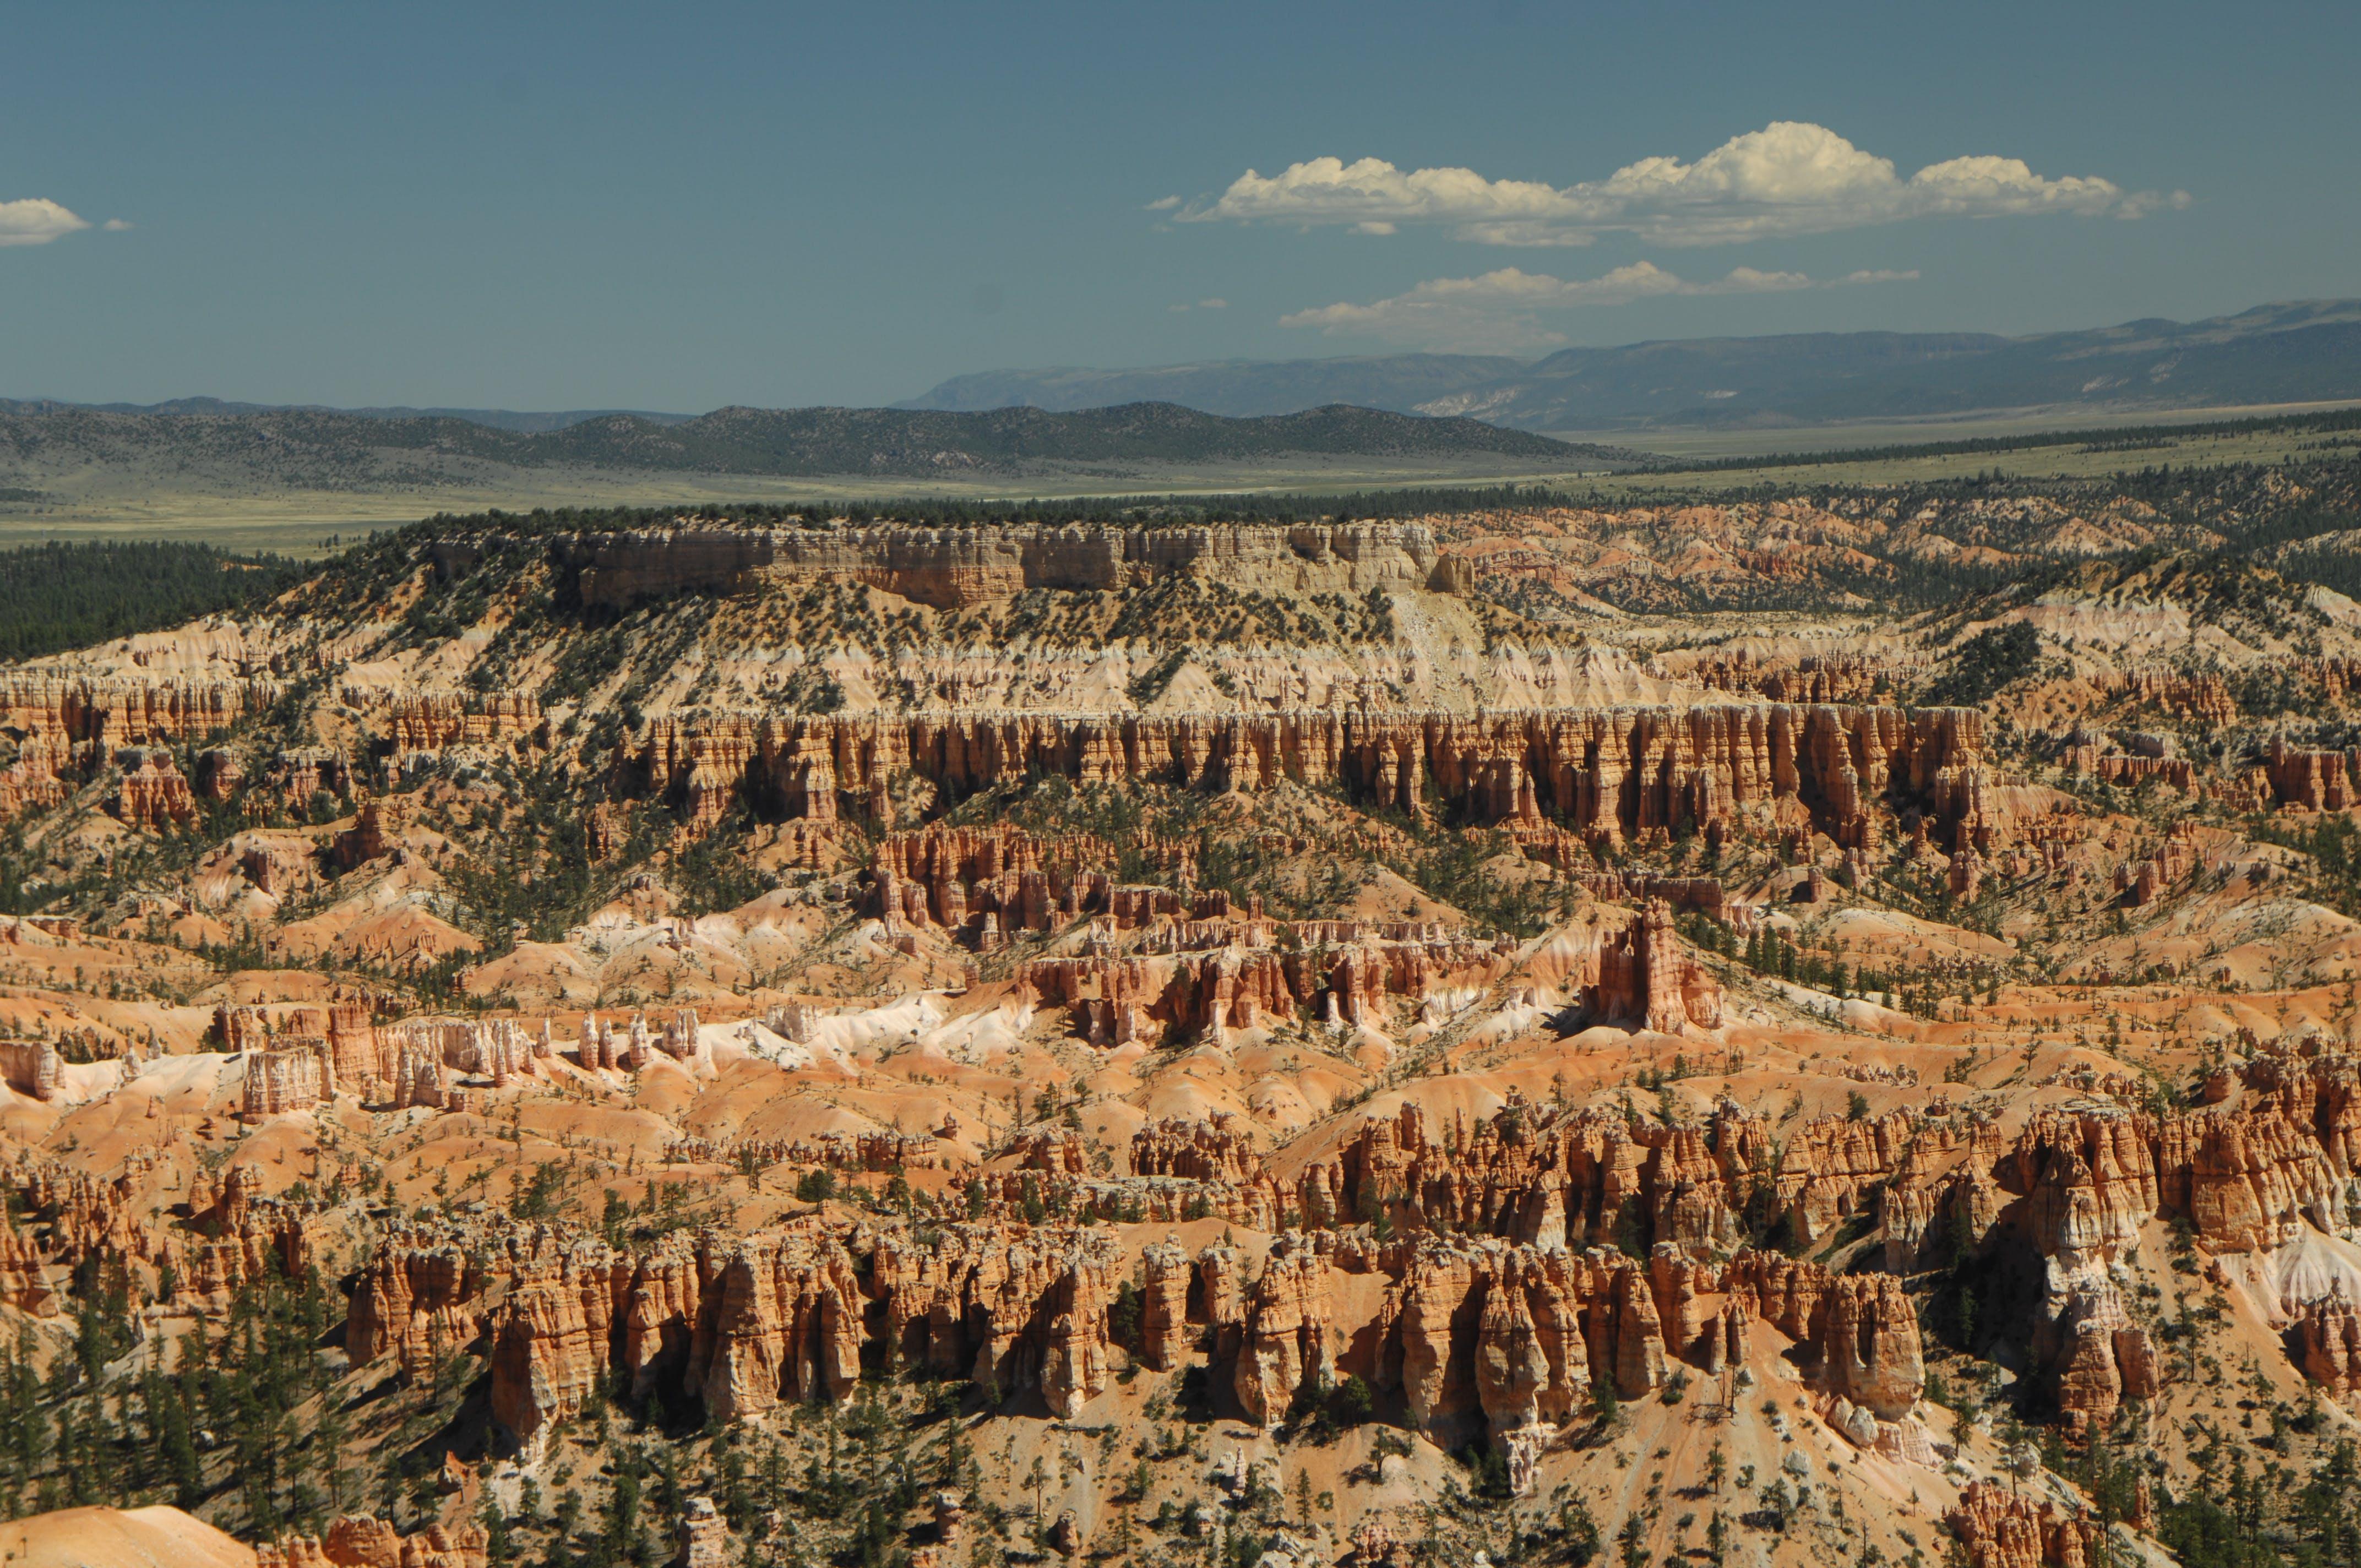 Kostenloses Stock Foto zu berge, canyon, dürr, erosion